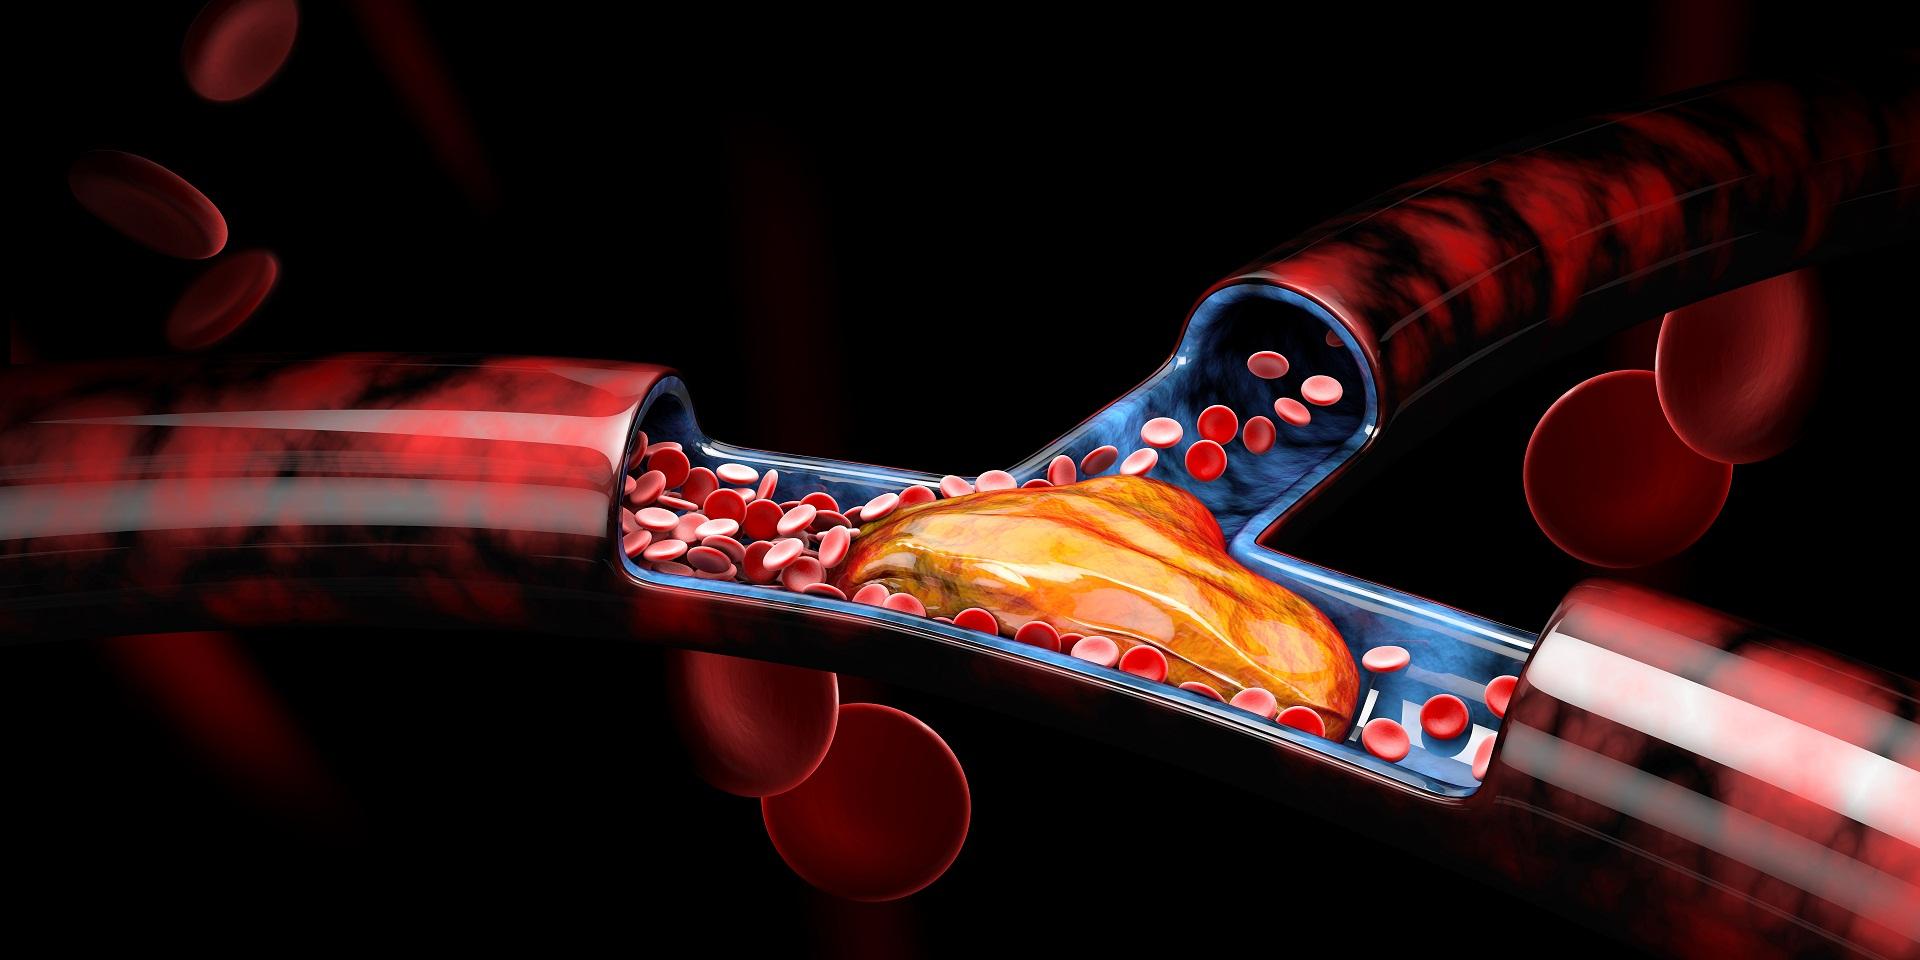 Deficiência da proteína S; dosagem da proteína S; trombofilia hereditária; perdas gestacionais, abortamento habitual, trombose venosa profunda (TVP).